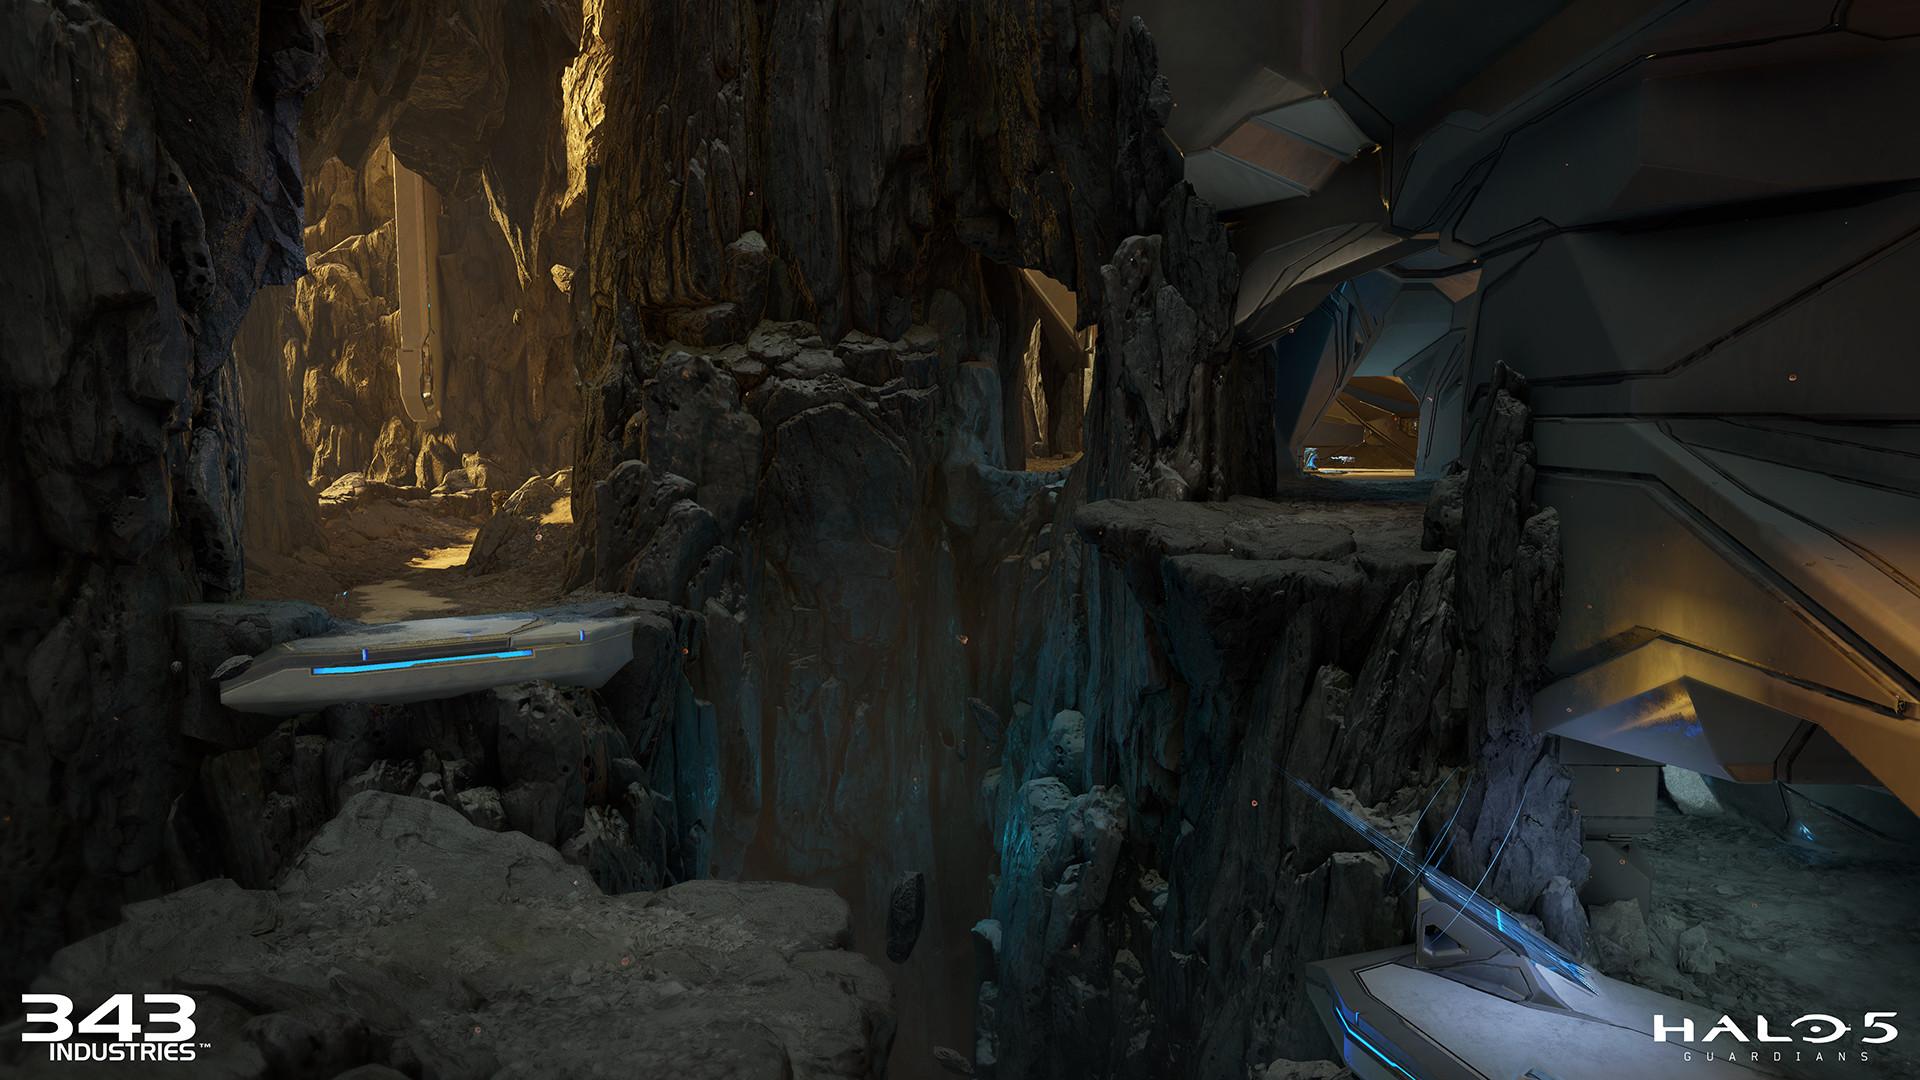 ArtStation - Halo 5: Guardians - Tyrant DLC, Aenok Oh